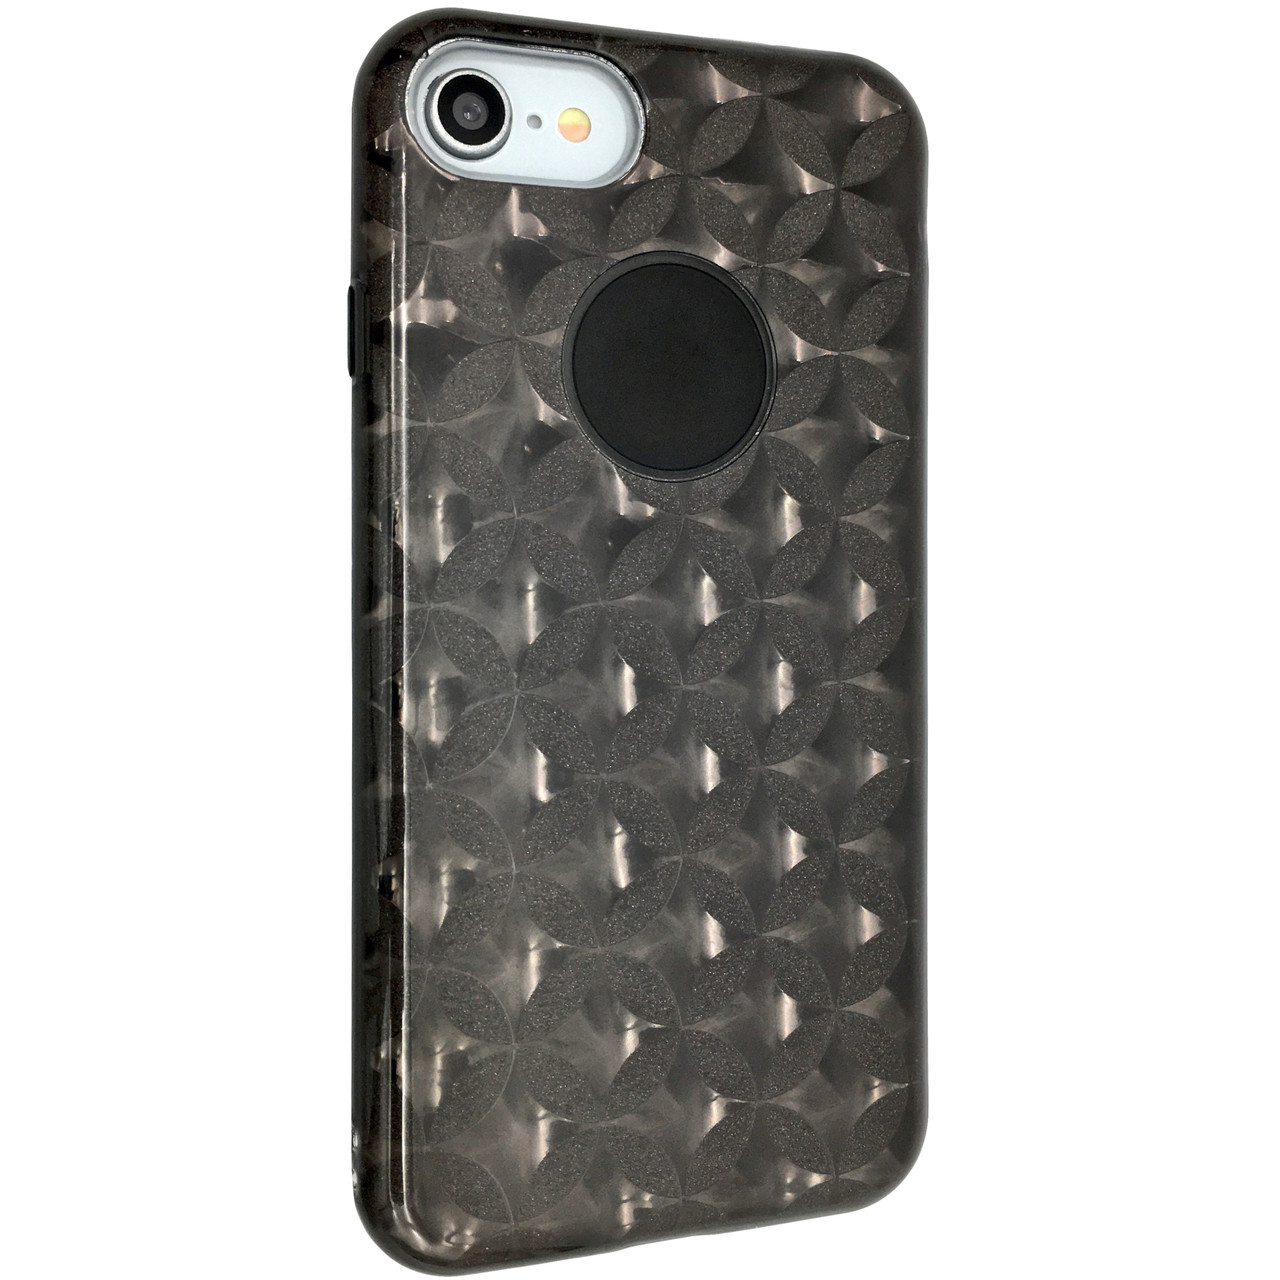 Чехол  райский дождик вставка Stars for Apple iPhone 7 (dark)